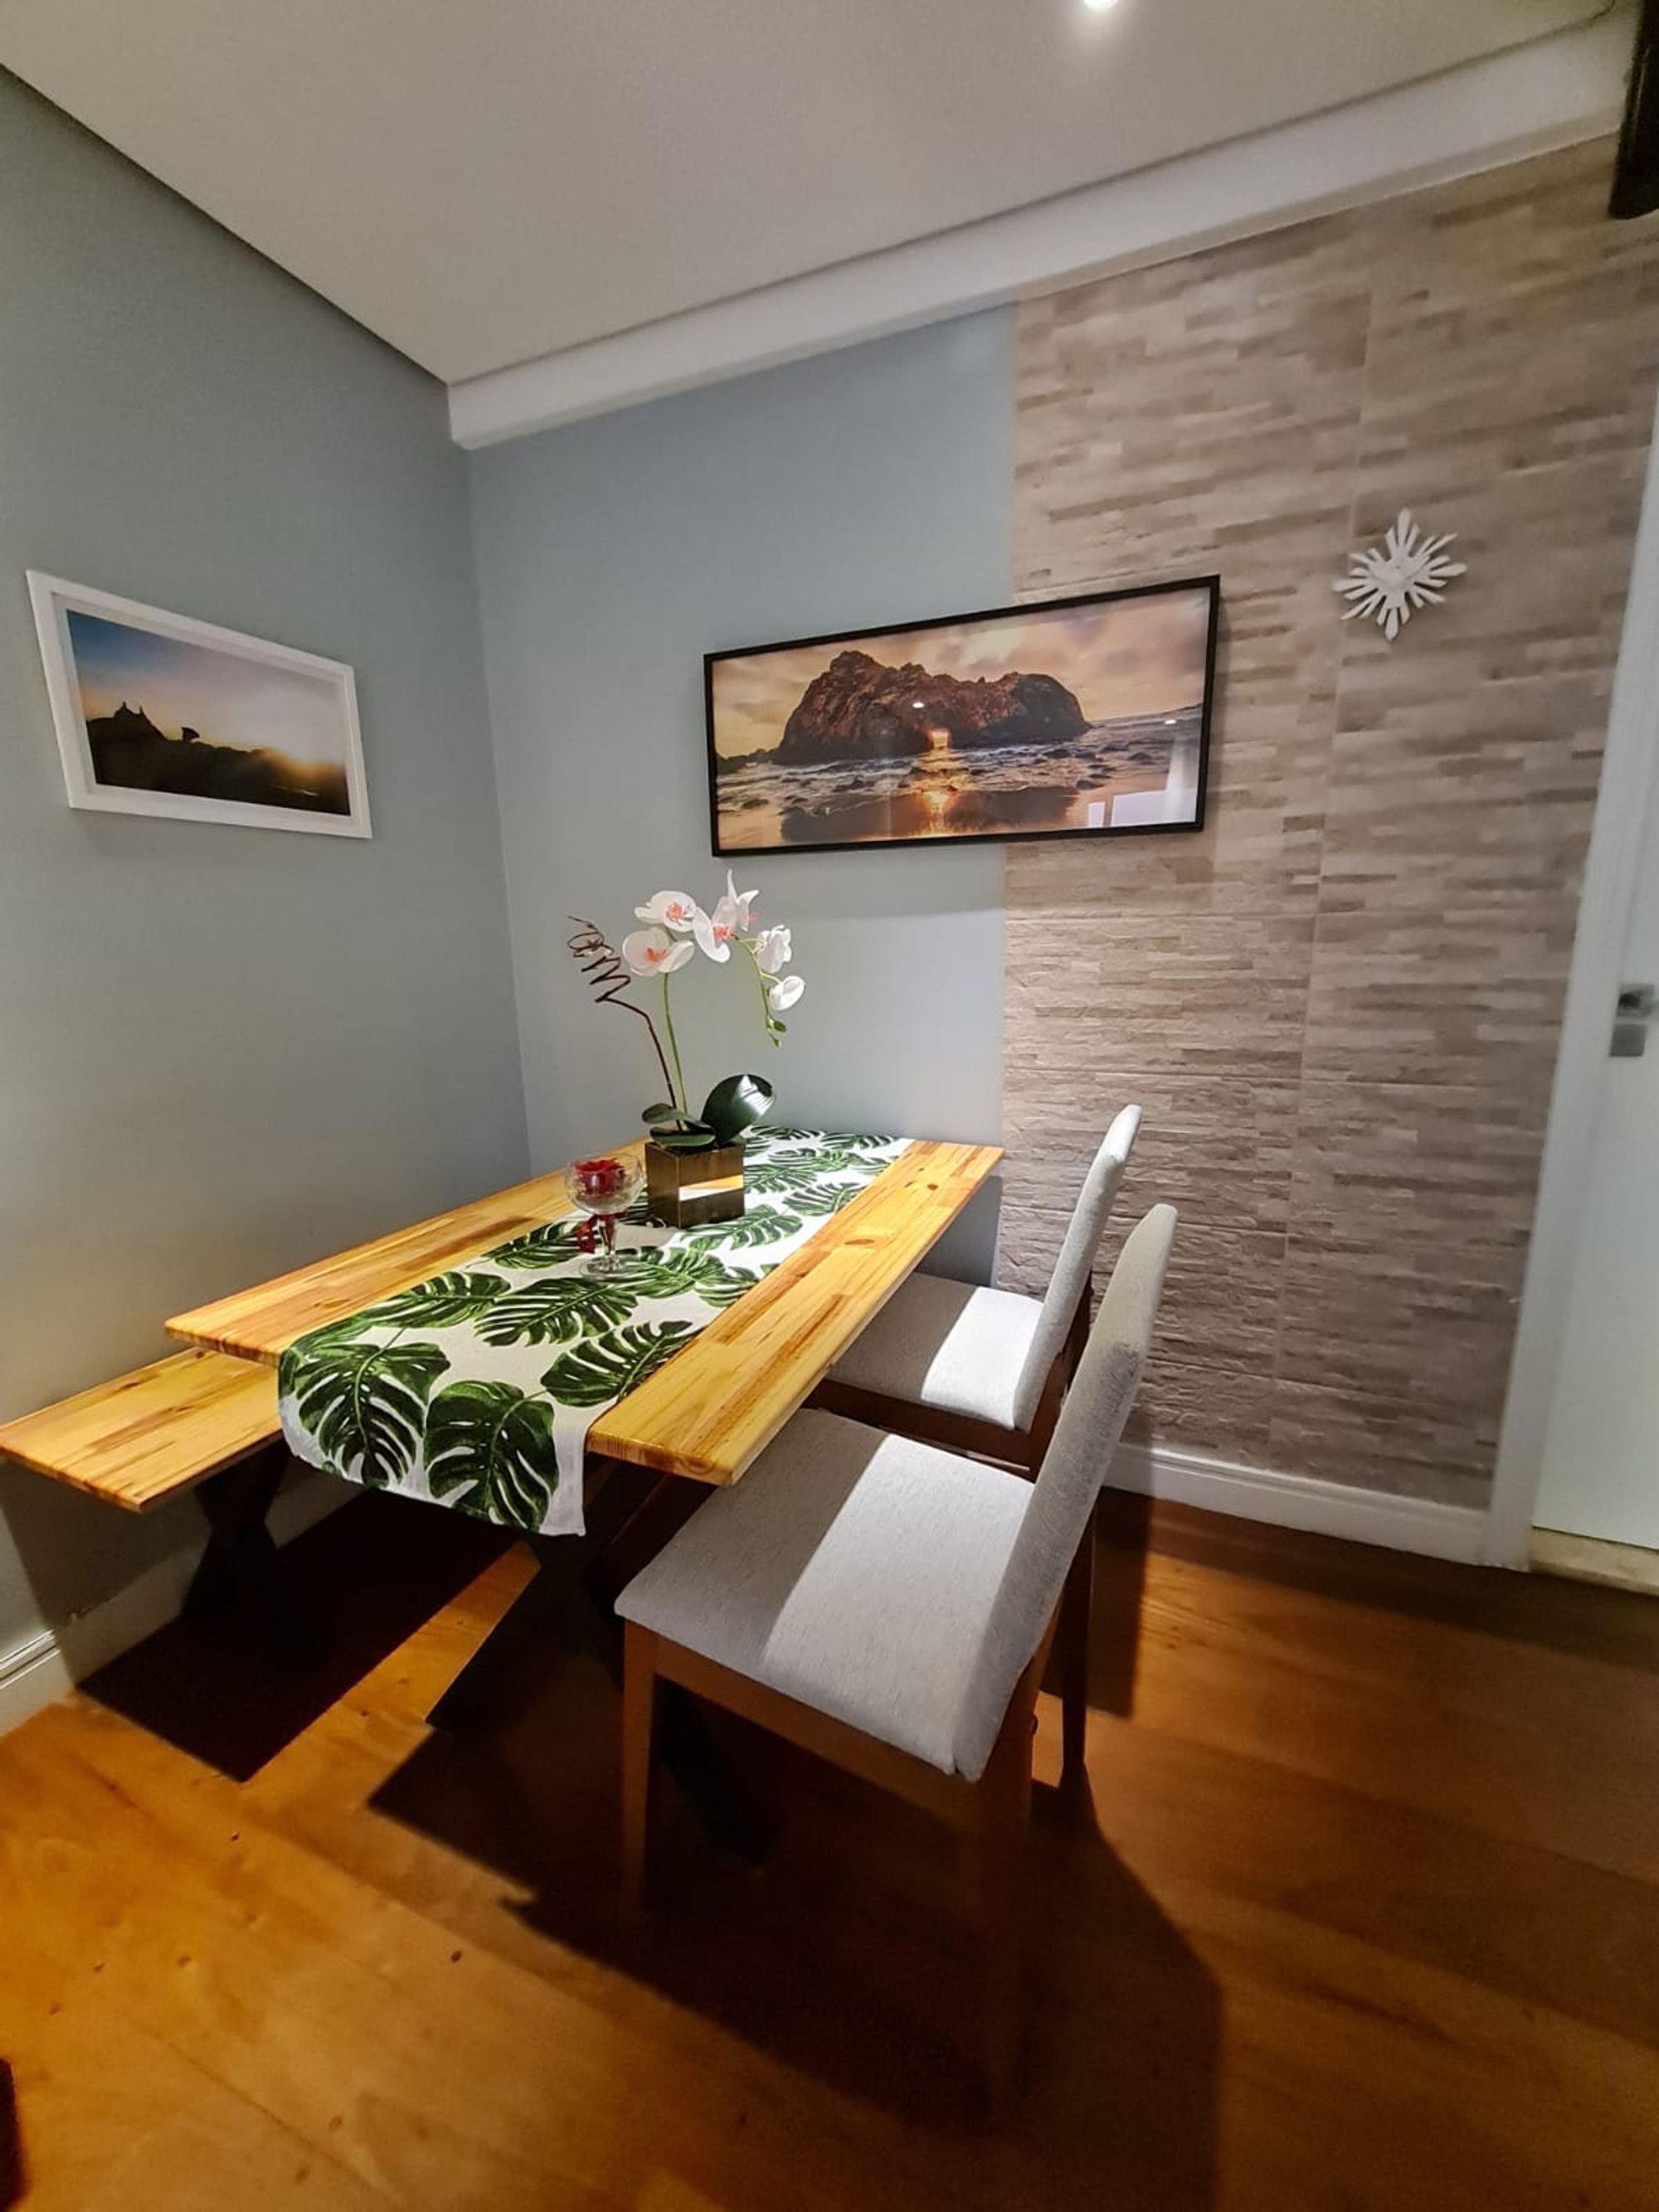 Foto de Sala com vaso de planta, televisão, vaso, cadeira, mesa de jantar